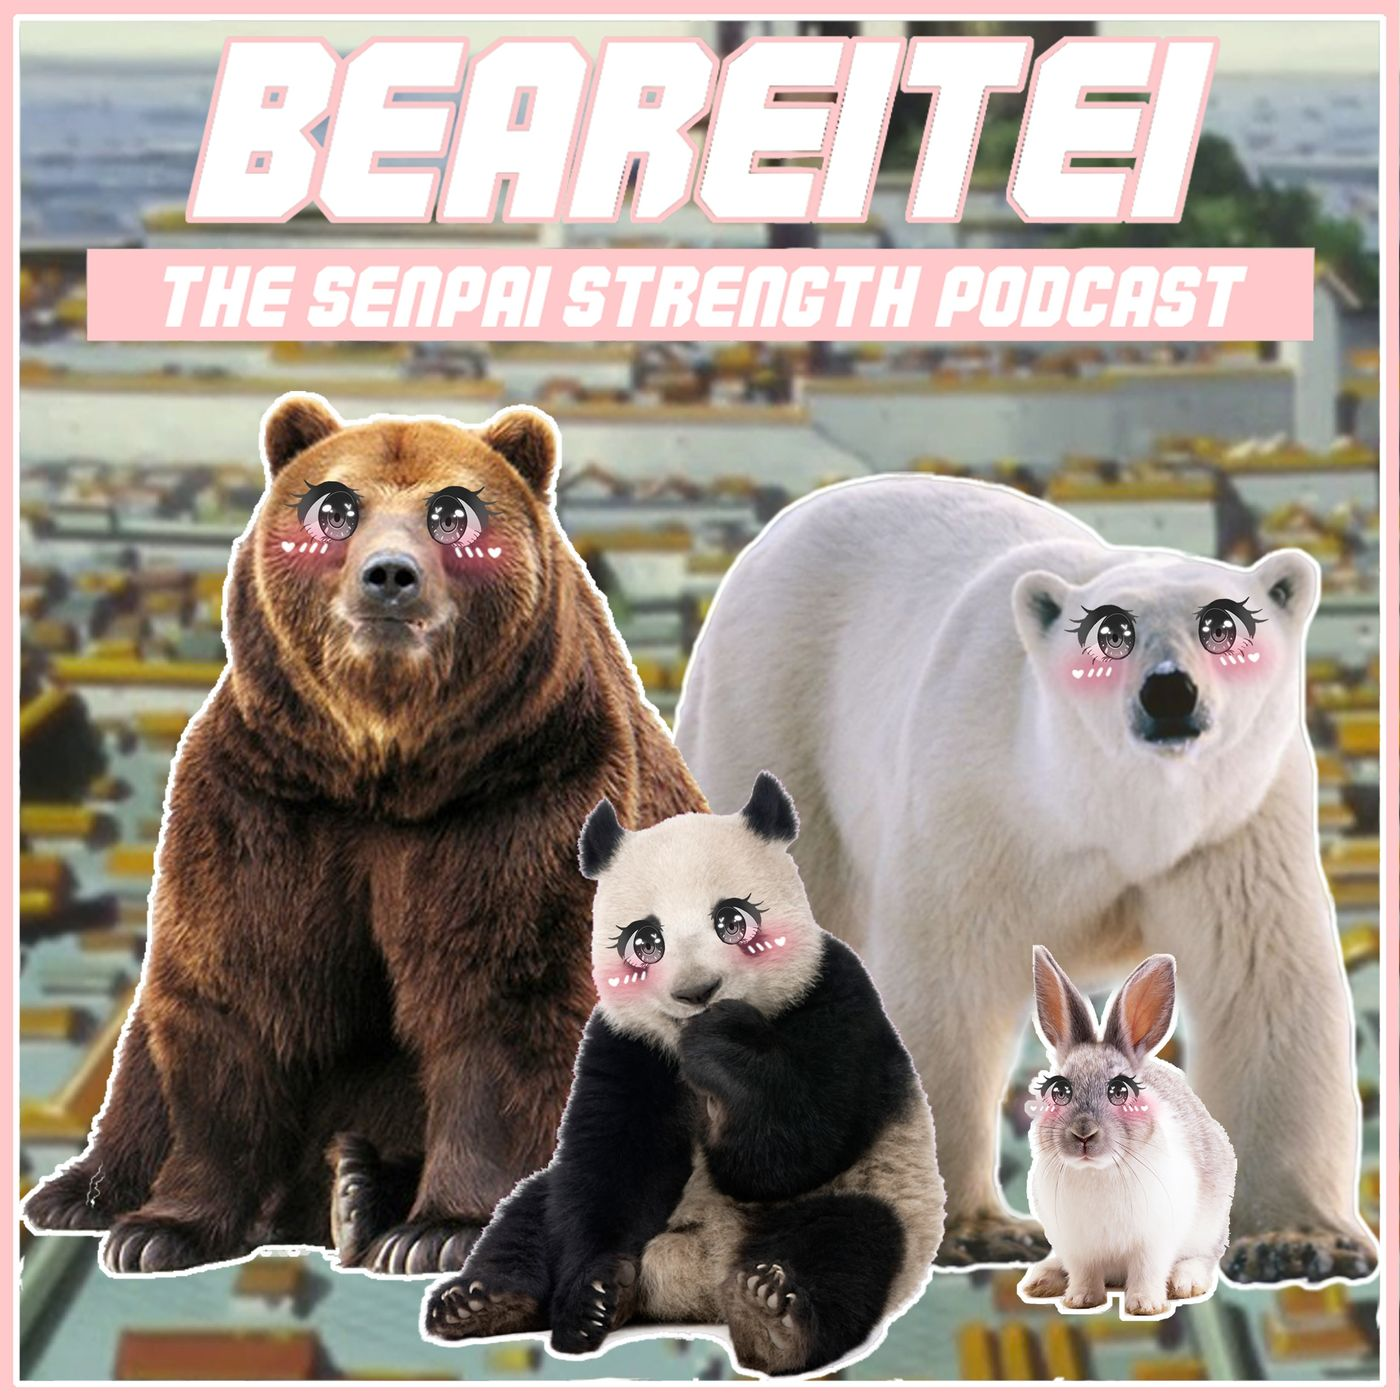 BEAREITEI 06: THE BUNNY AND THE BEAR GAMES